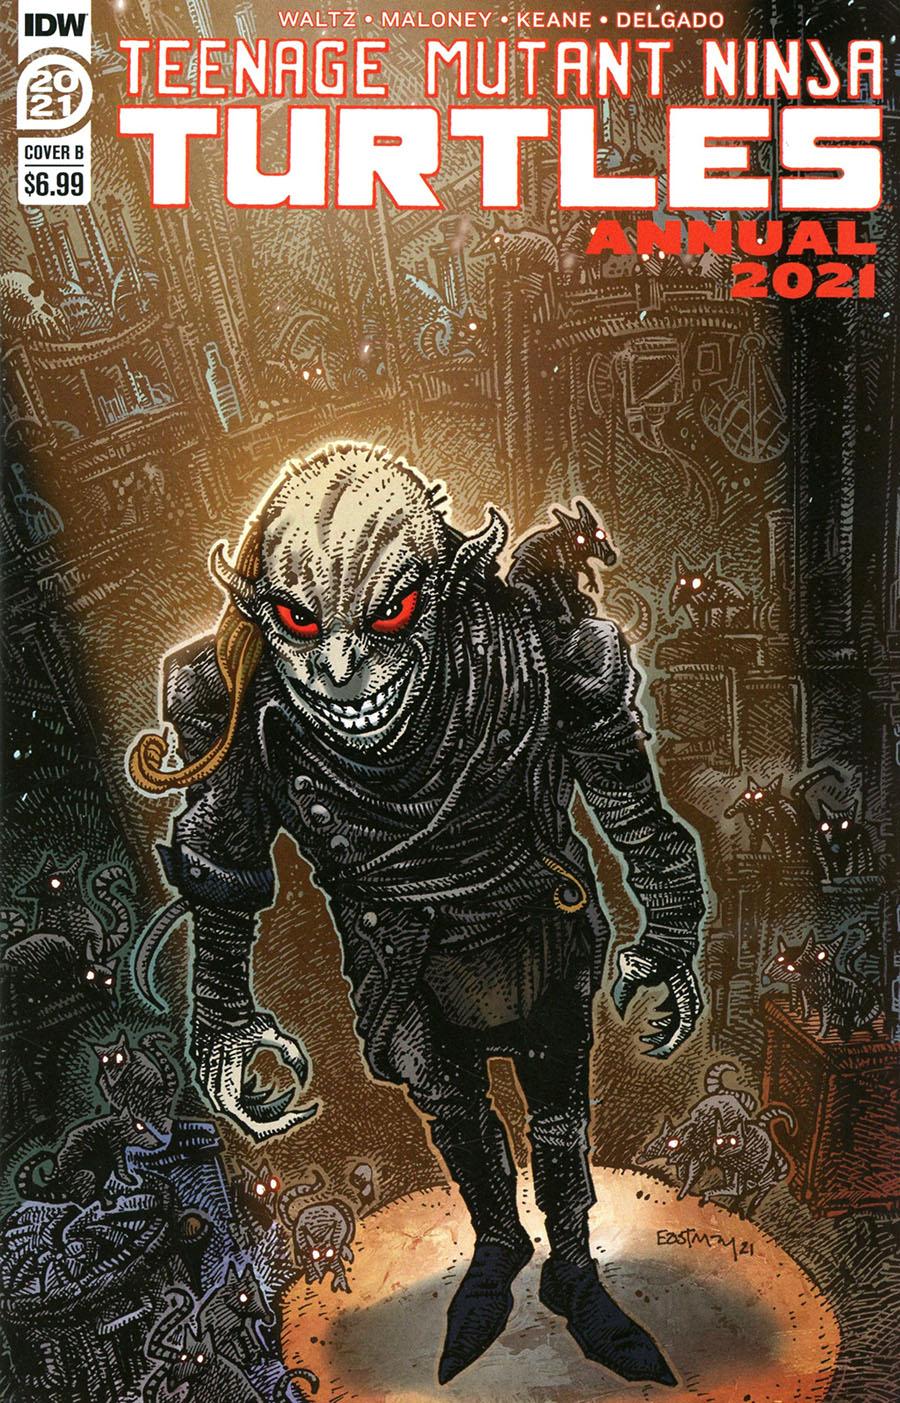 Teenage Mutant Ninja Turtles Vol 5 Annual 2021 Cover B Variant Kevin Eastman Cover